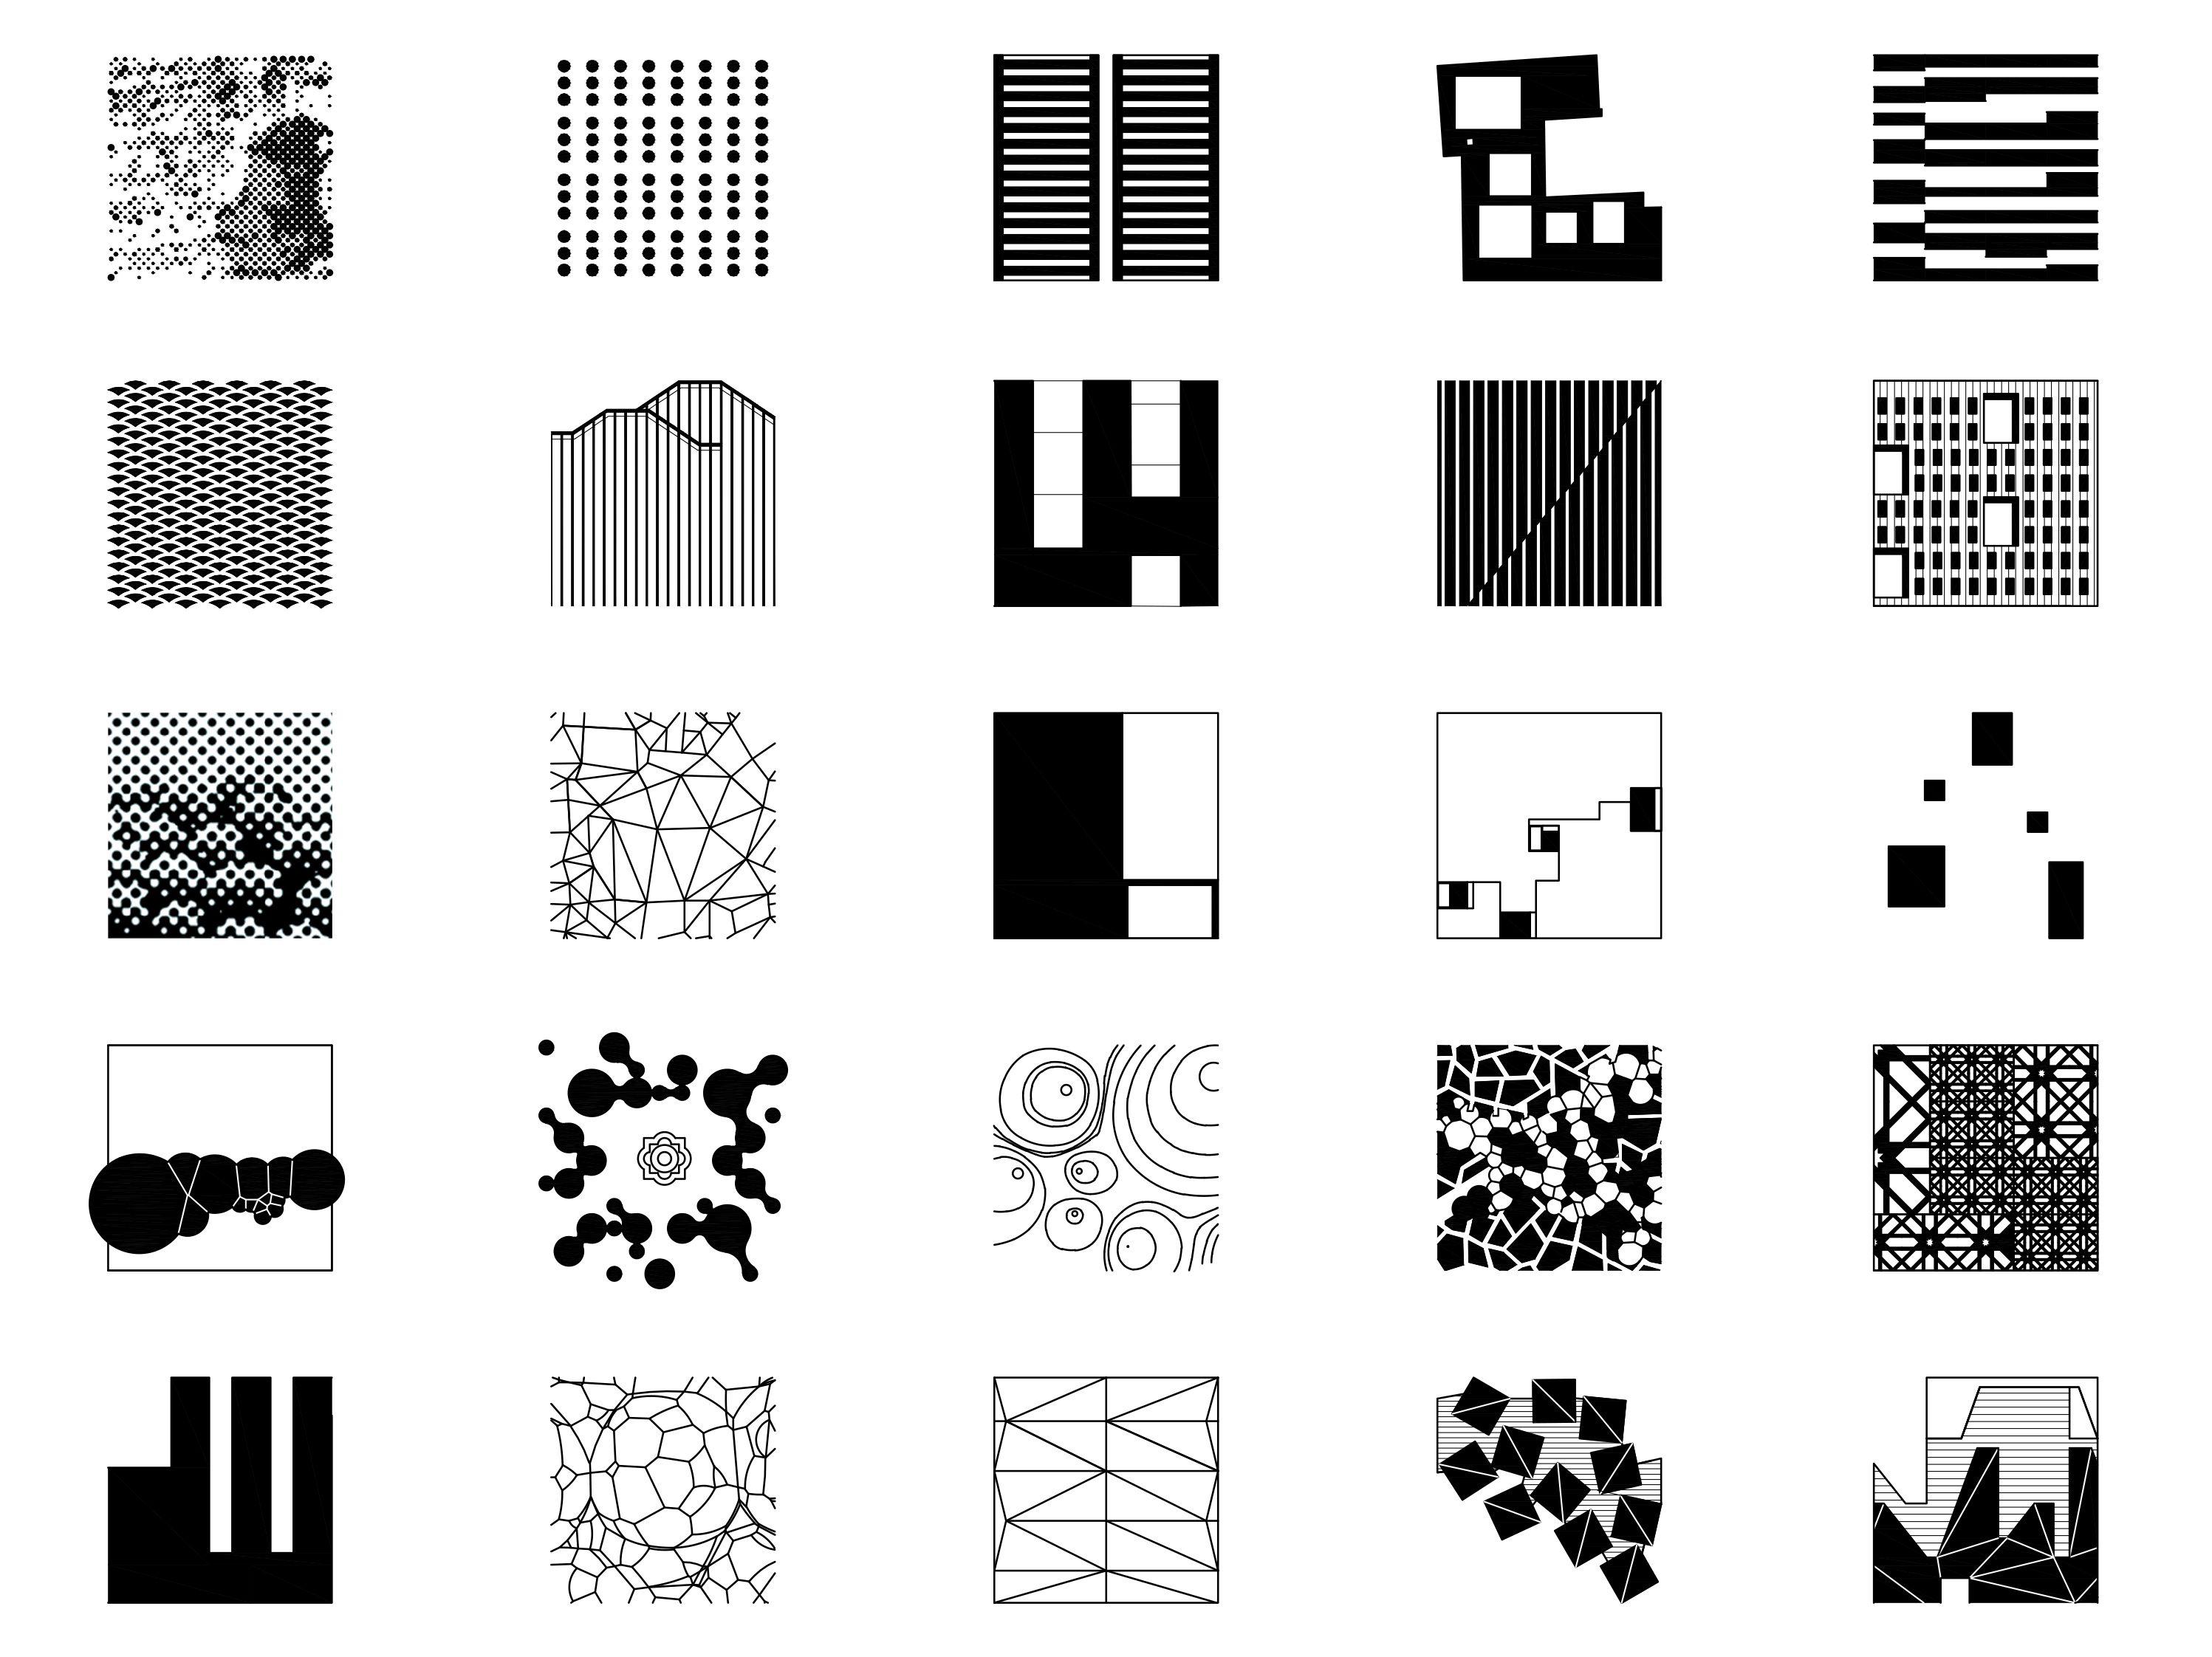 Diagramy stan allen abstract spatial diagrams pinterest diagramy stan allen abstract spatial diagrams pinterest diagram and architecture publicscrutiny Images